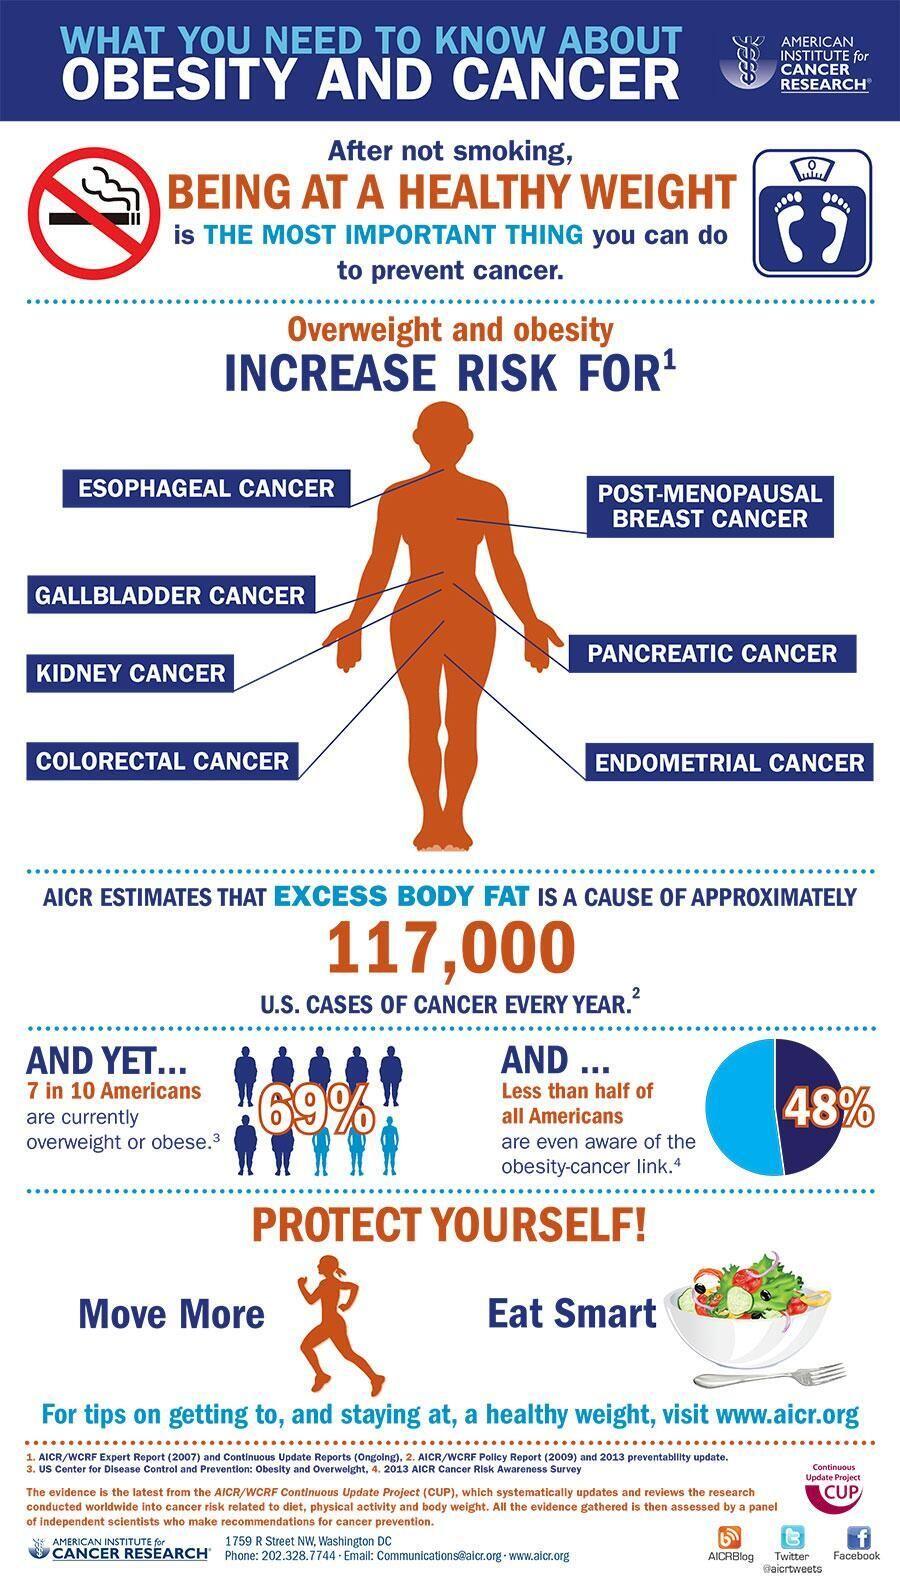 Tom Rath On Twitter Cancer Prevention Cancer Obesity